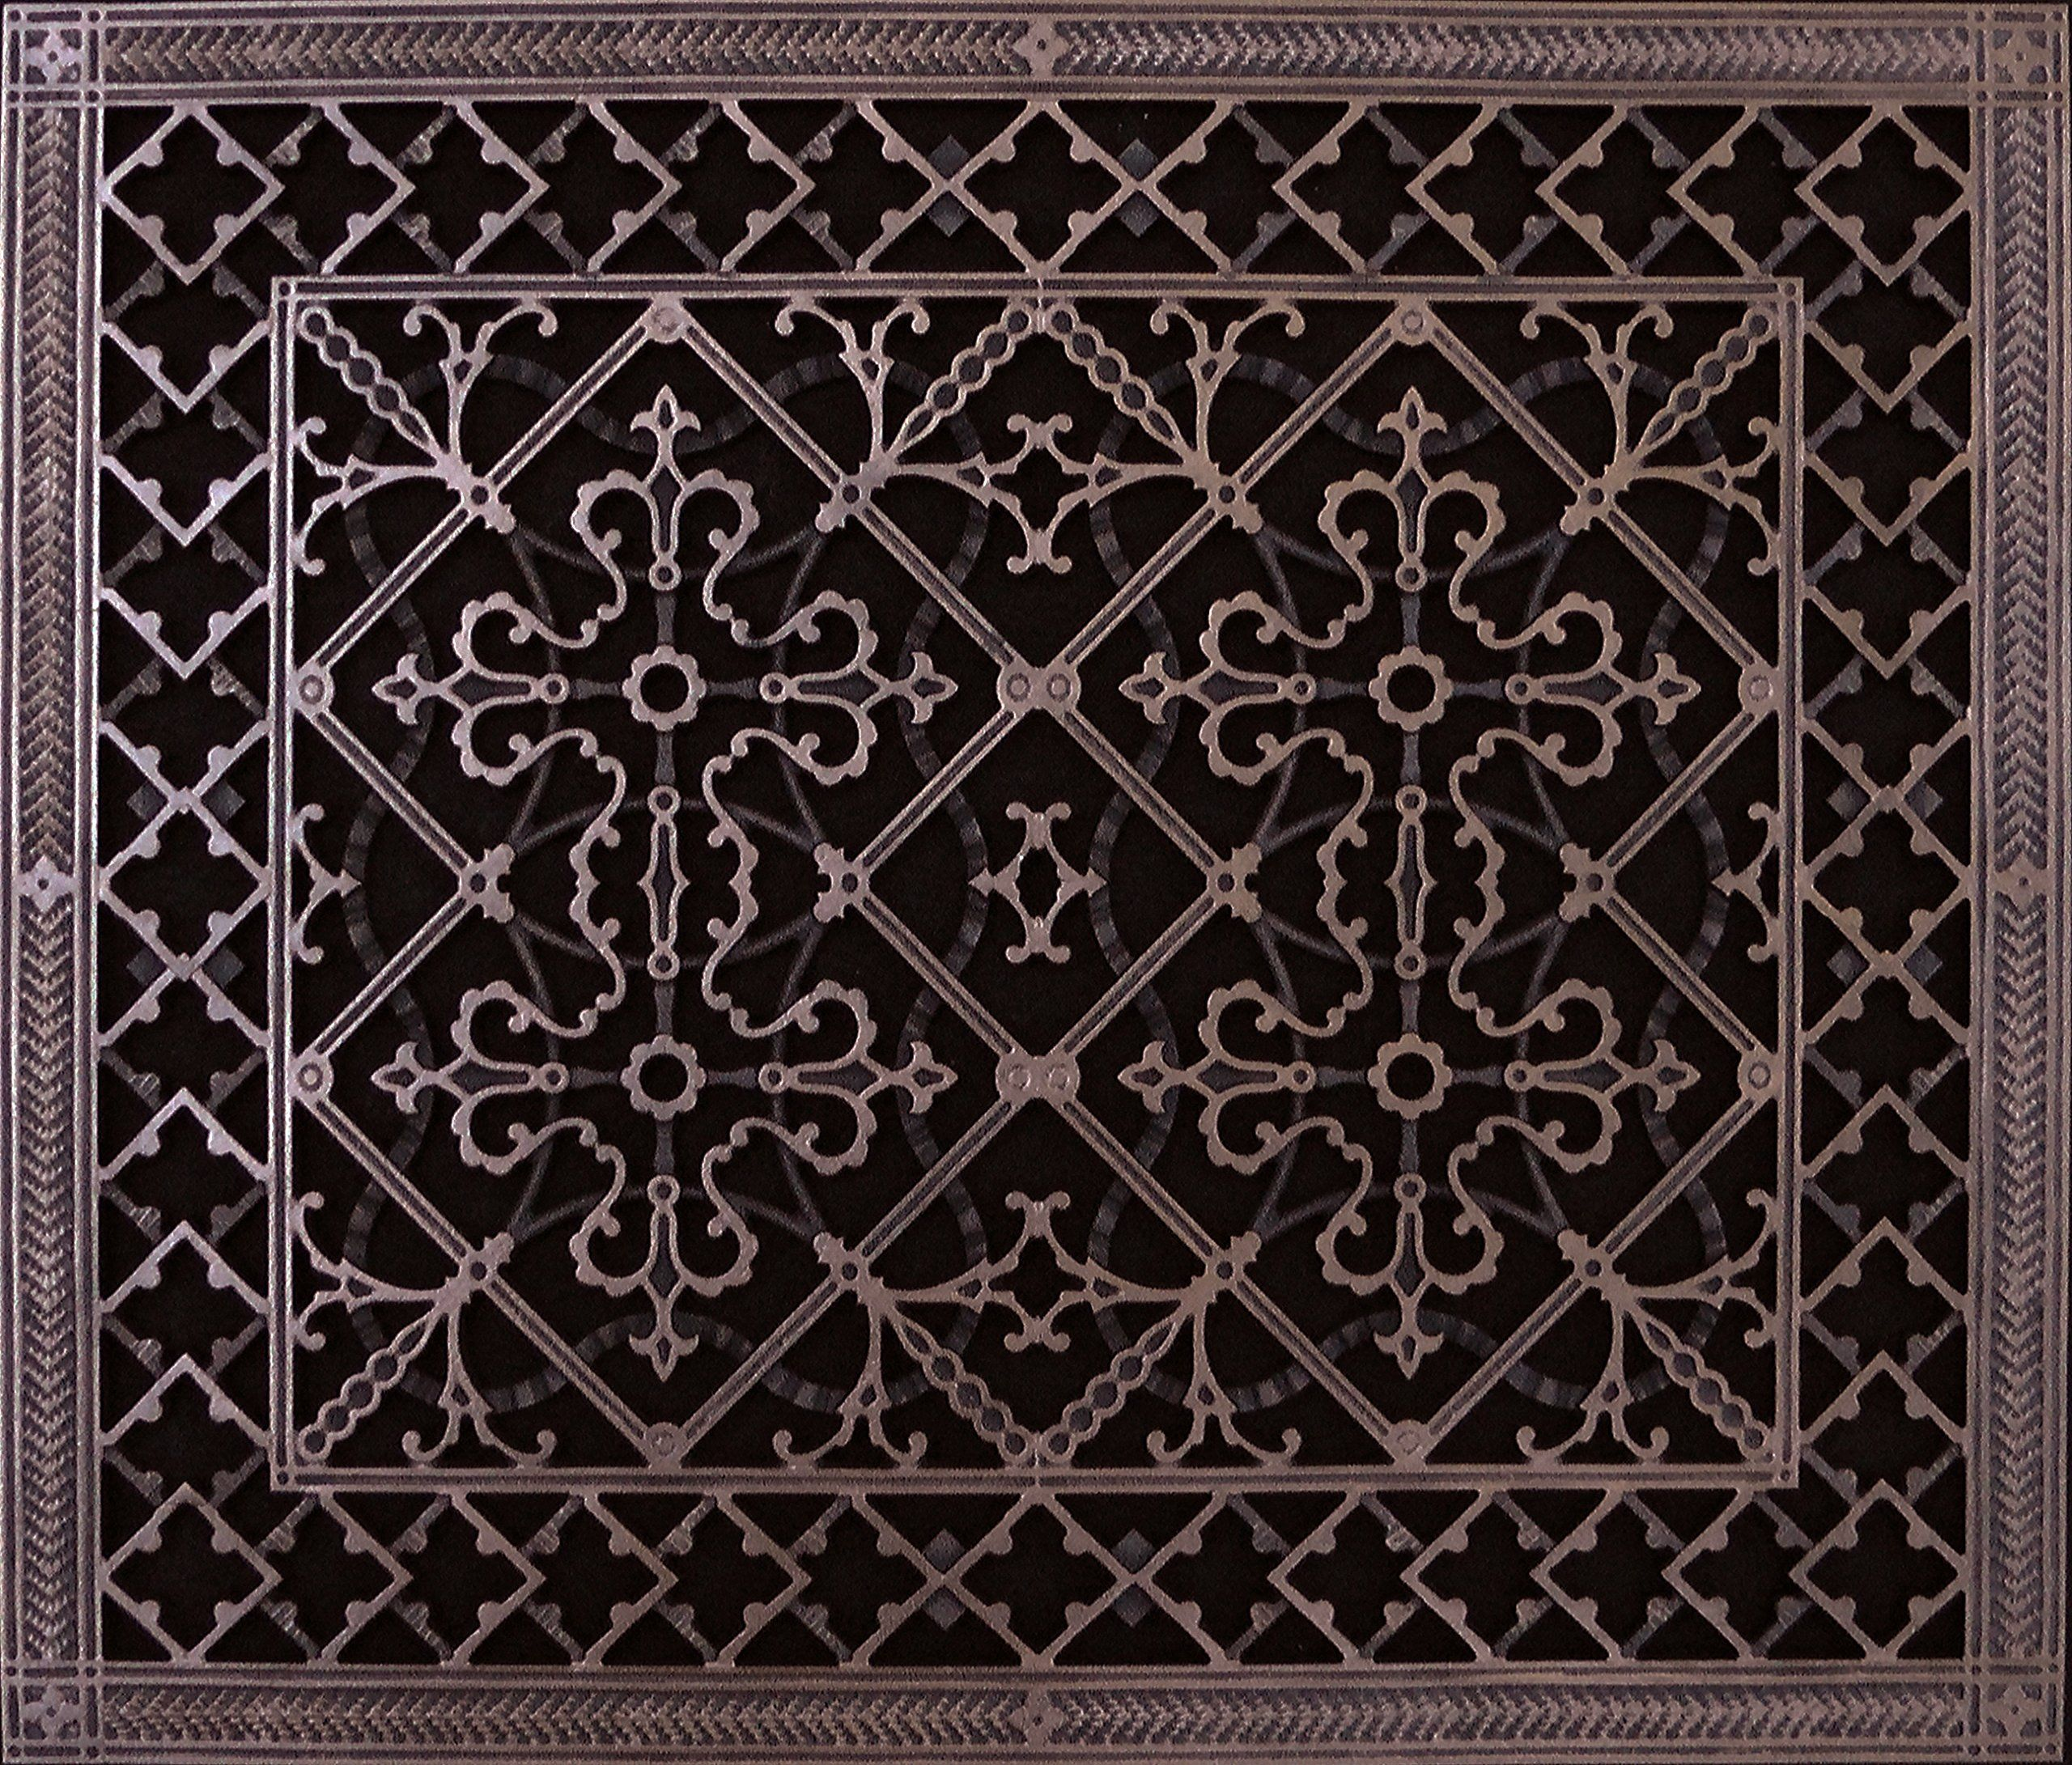 Decorative Grill Register, Vent Cover. Decorative Grille